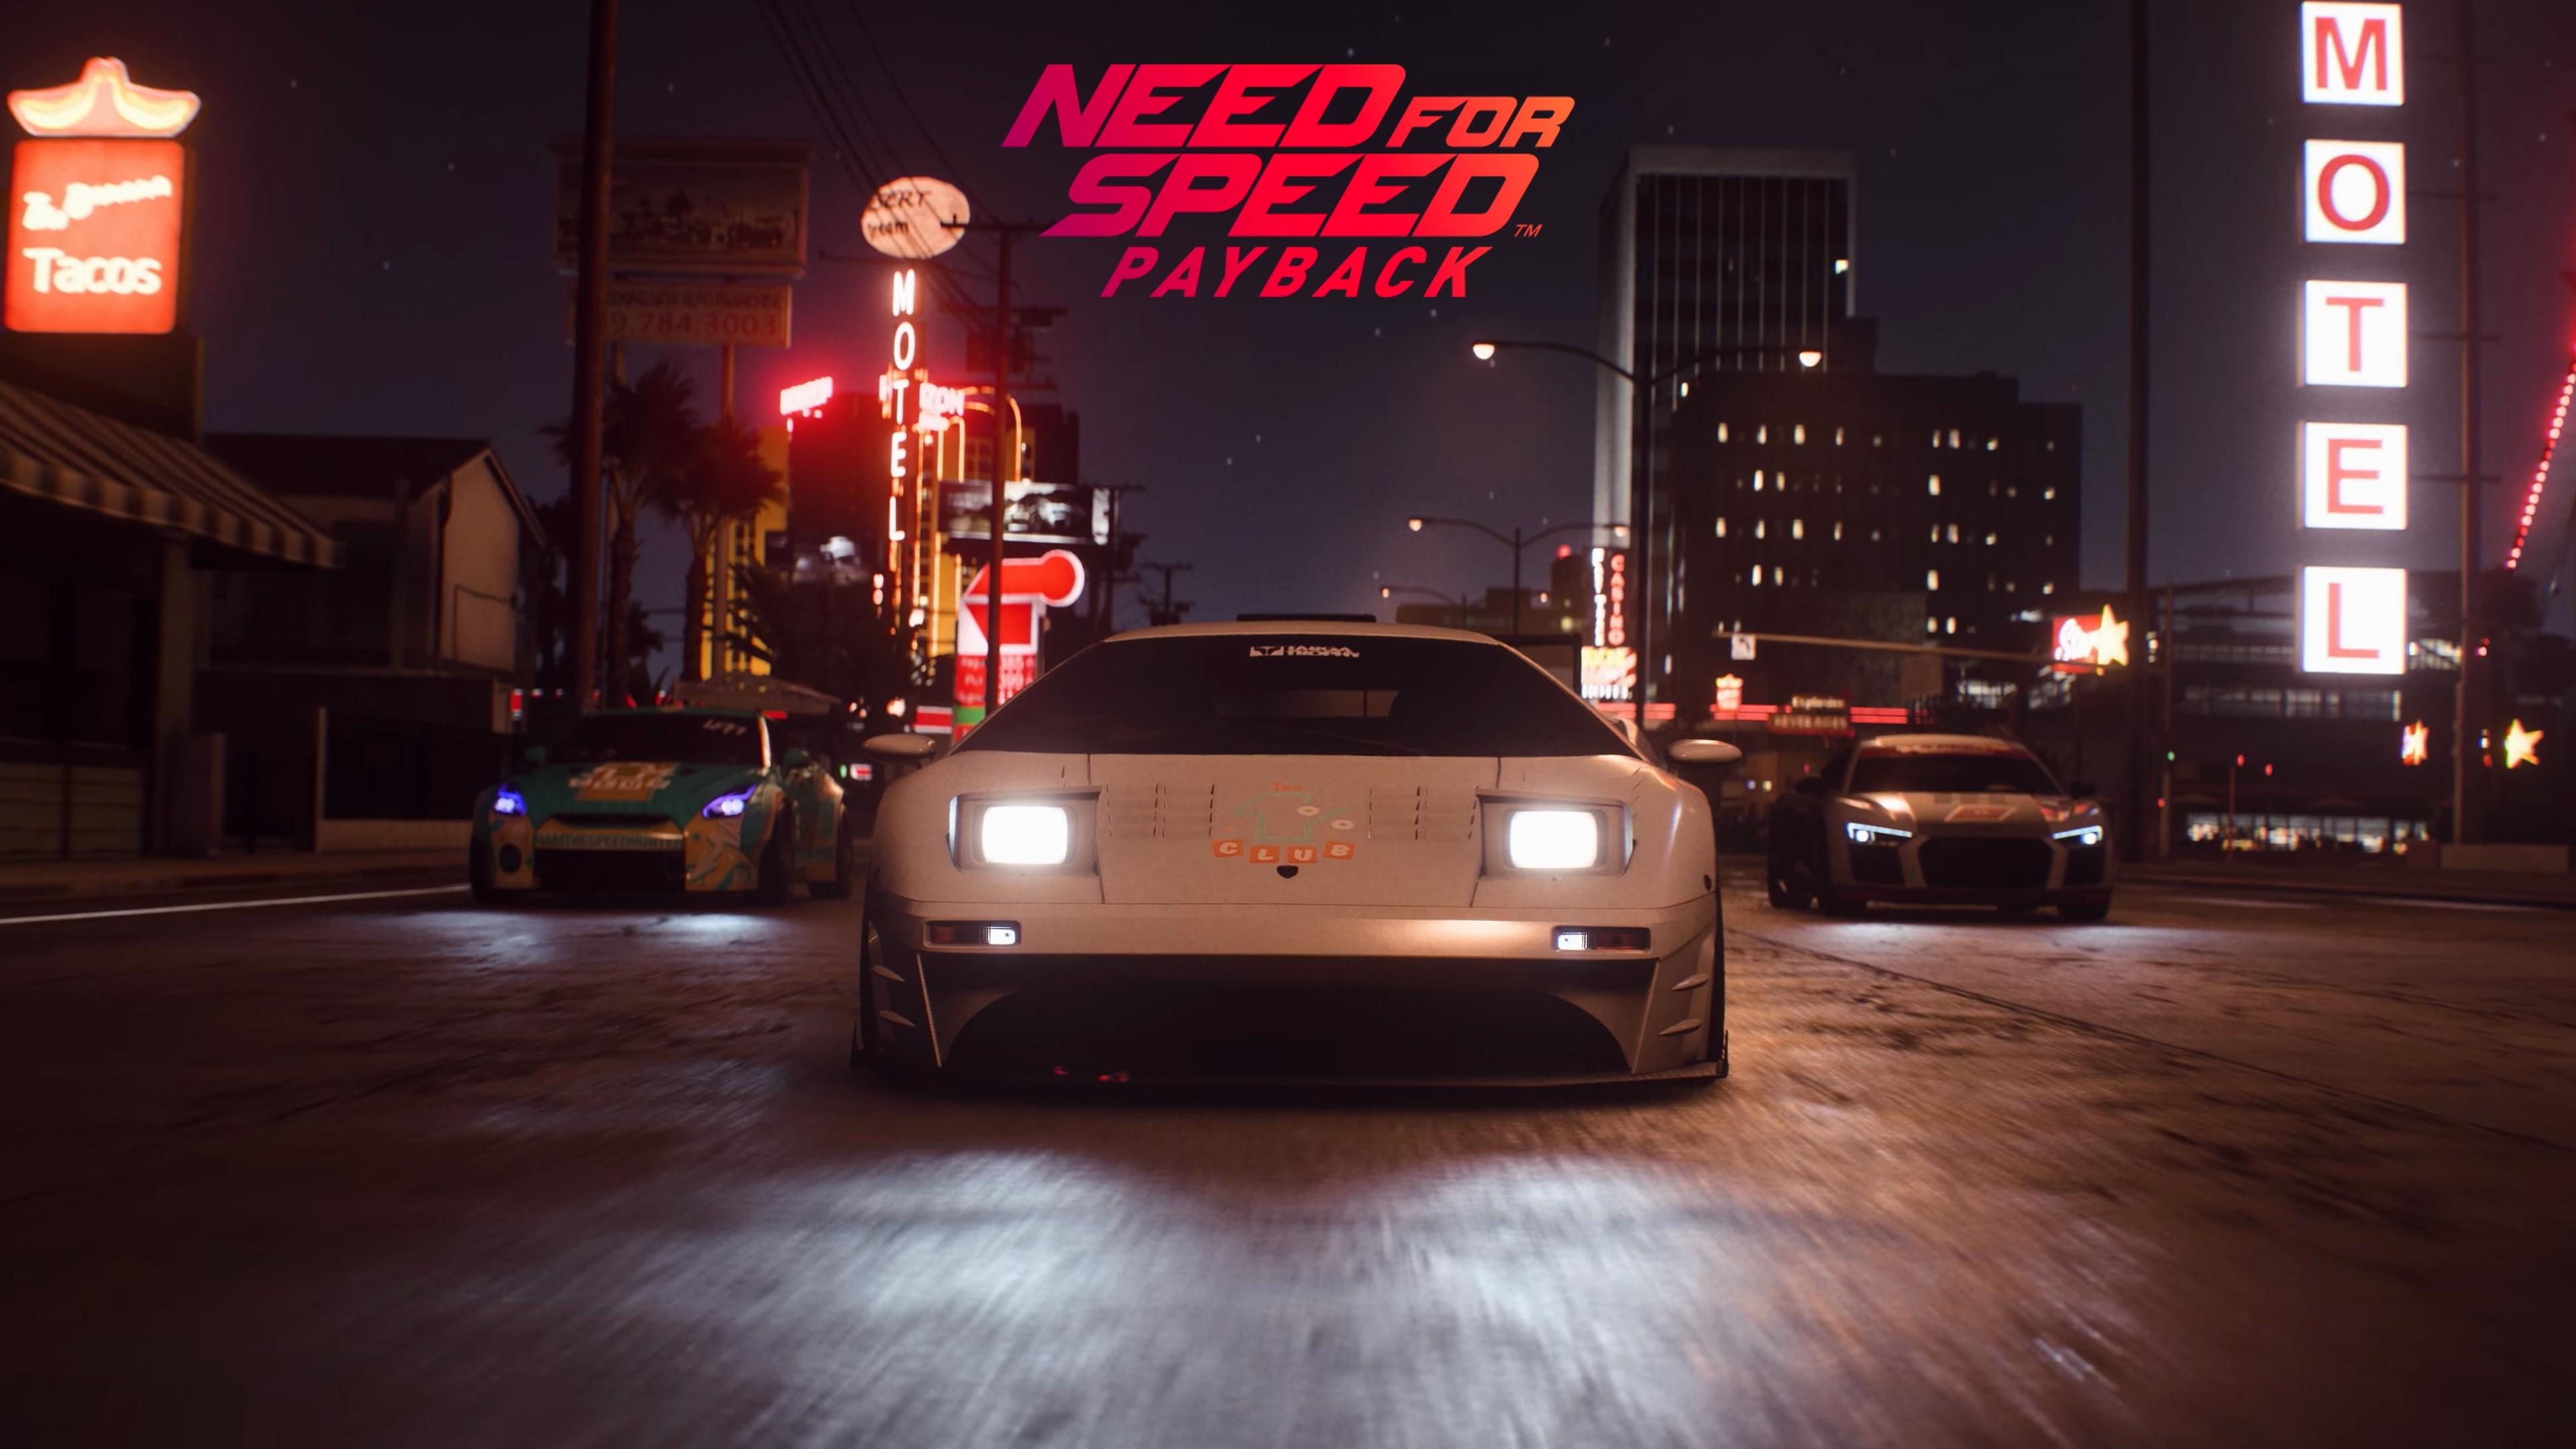 Lamborghini Diablo Sv 4k Ultra Hd Wallpaper Hintergrund